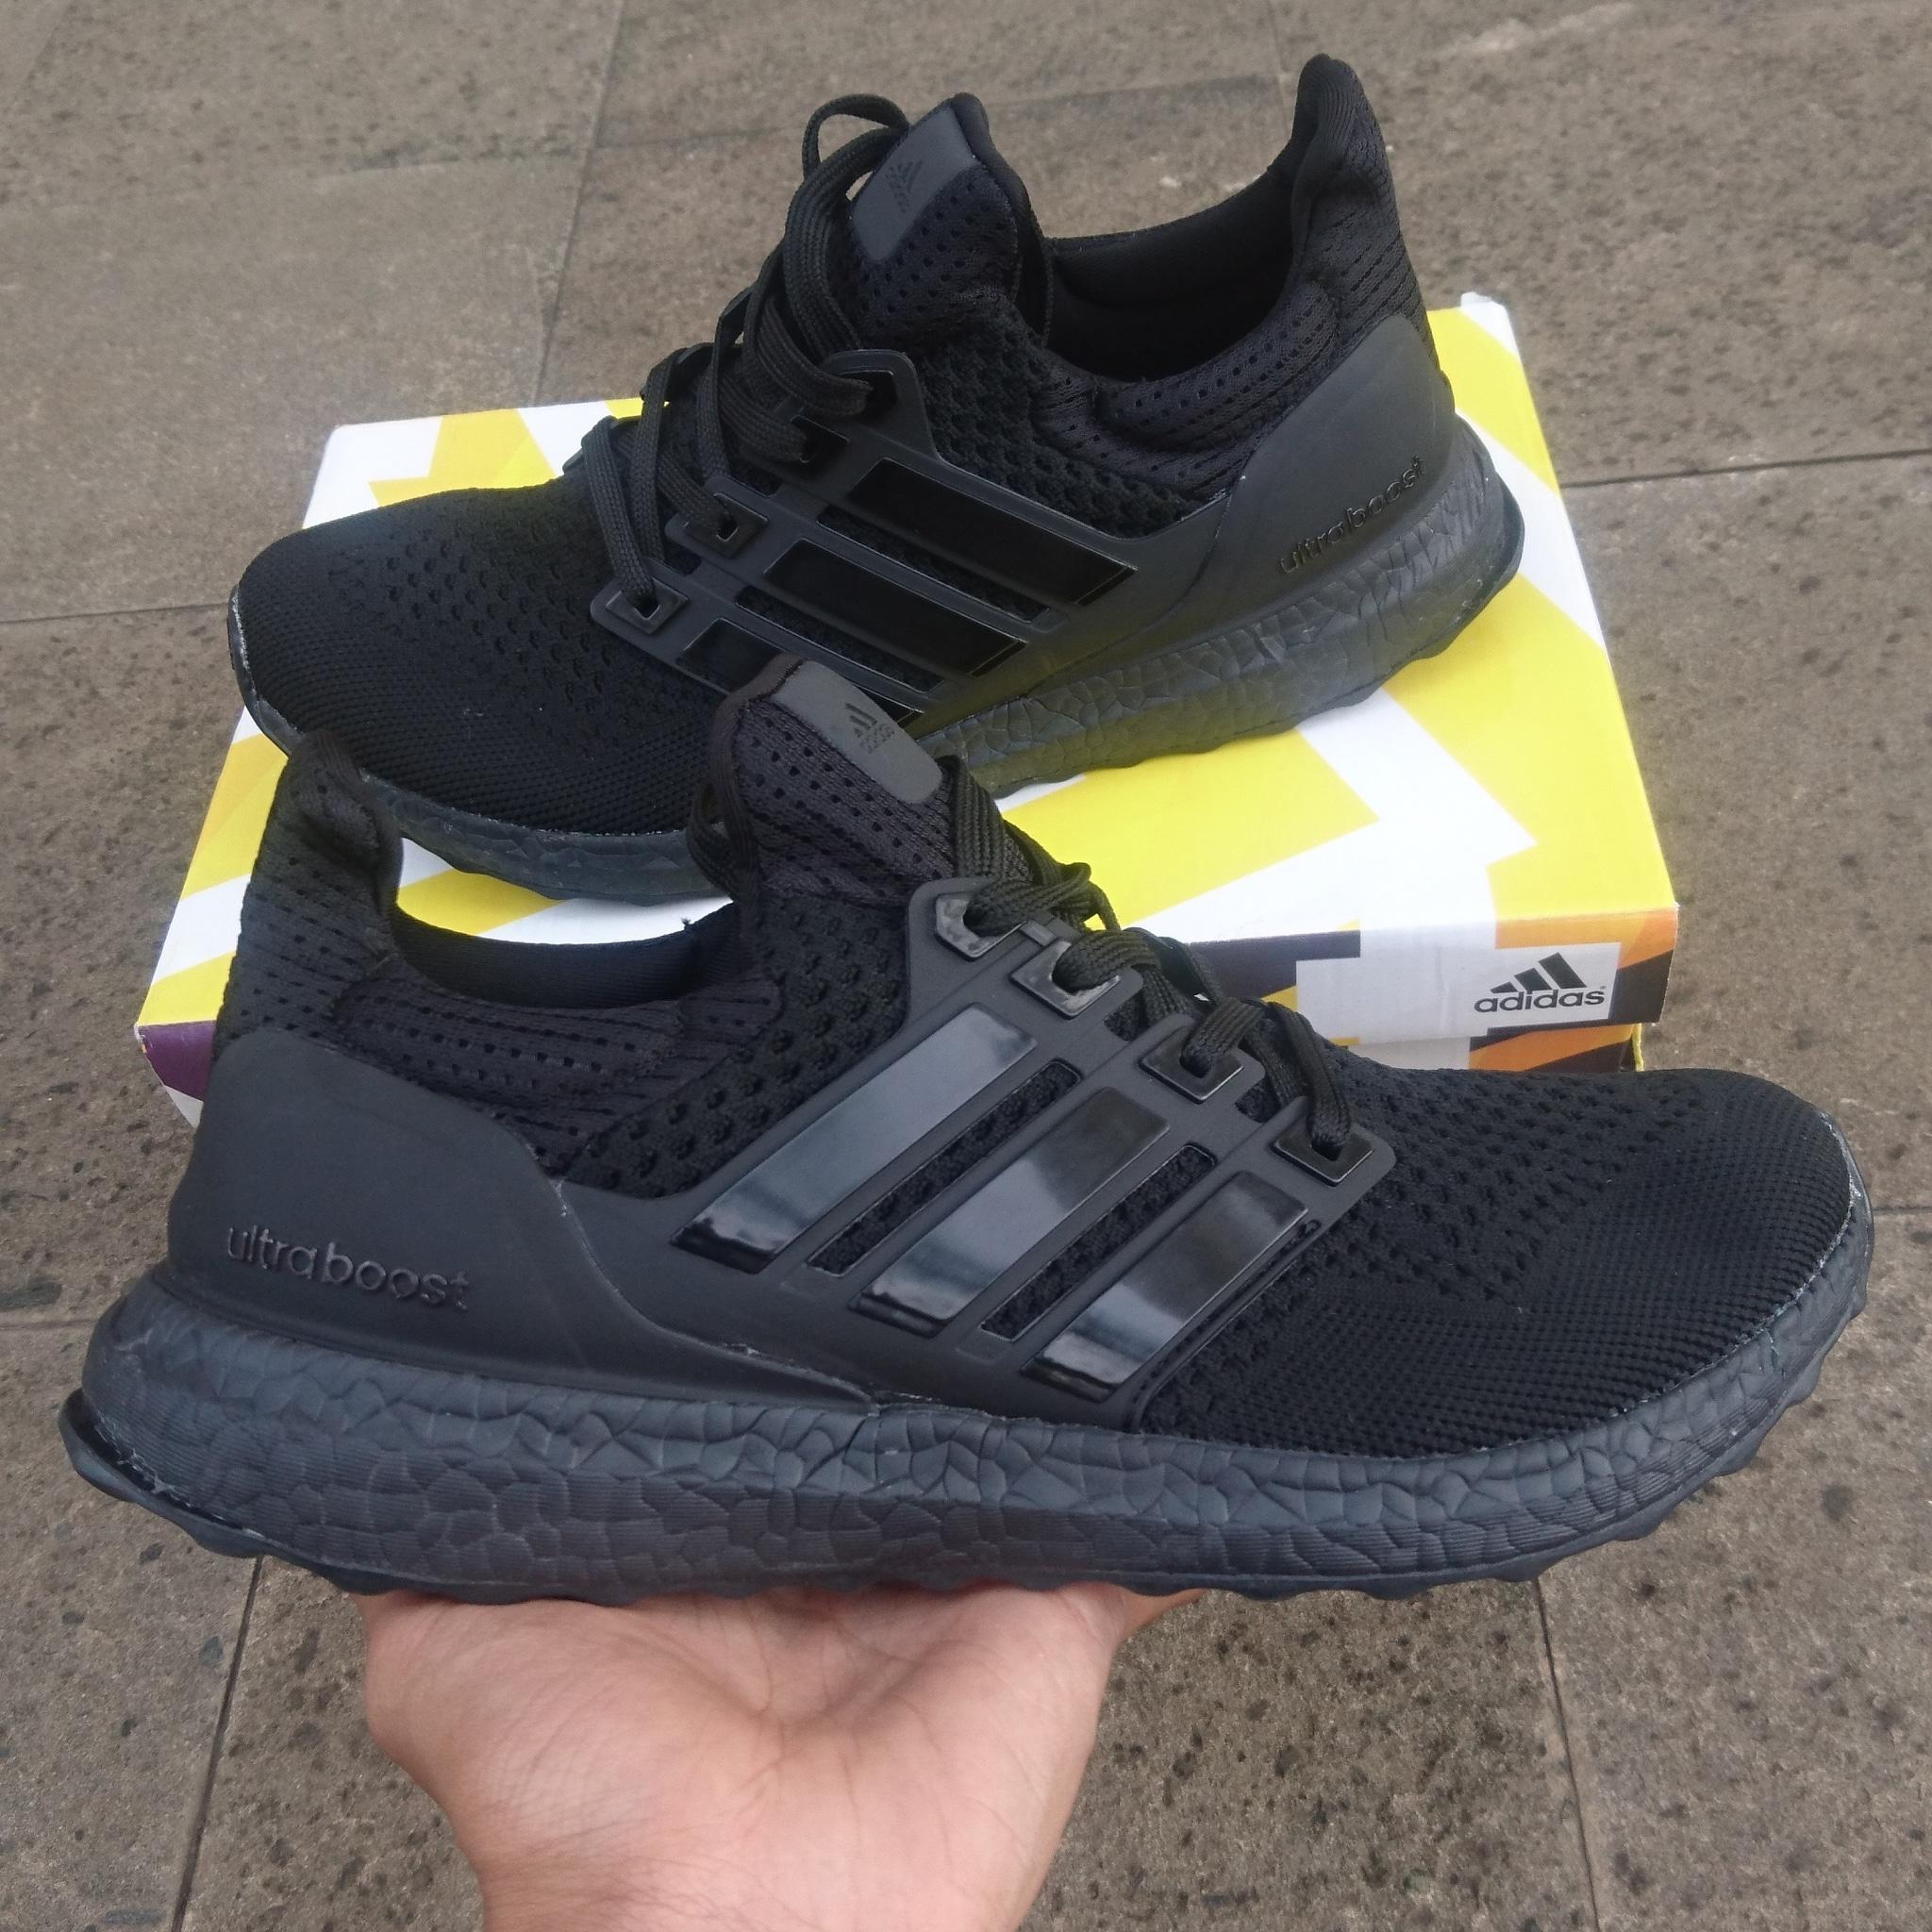 0fd53554e14d4 ... authentic jual sepatu adidas ultra boost triple black premium quality  adhezta sport tokopedia 536bf 1ca2a